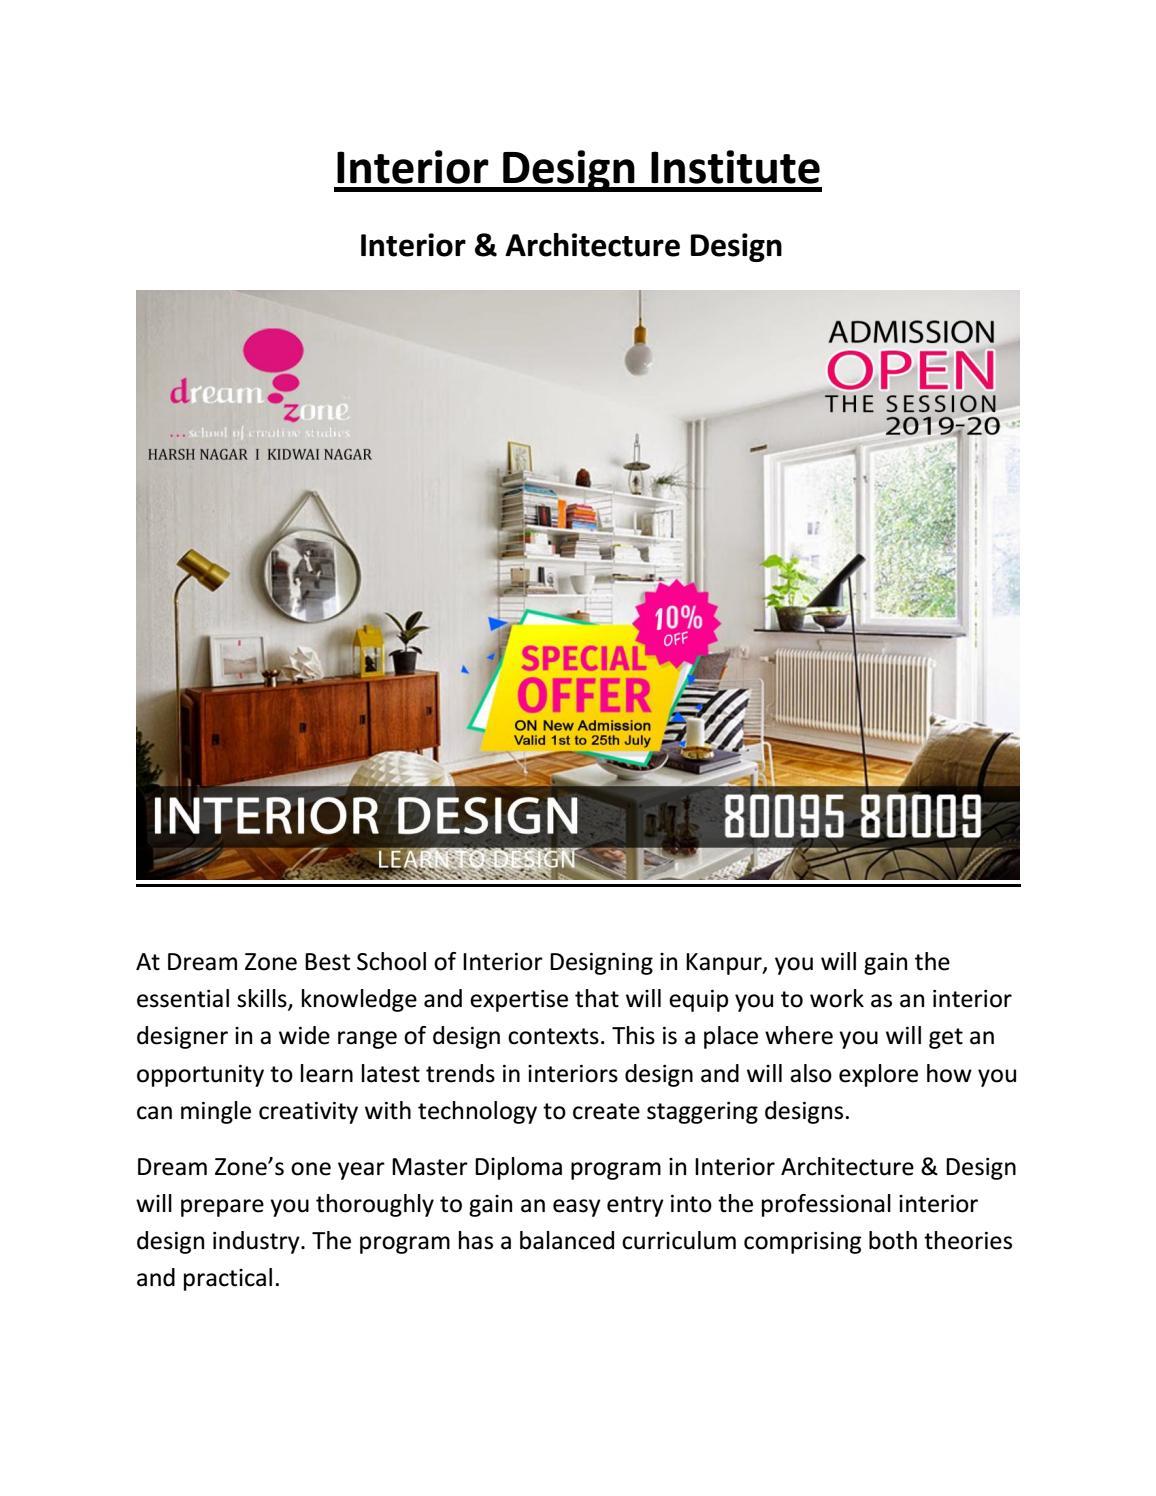 Interior Design Institute By Dreamzone Kanpur Issuu